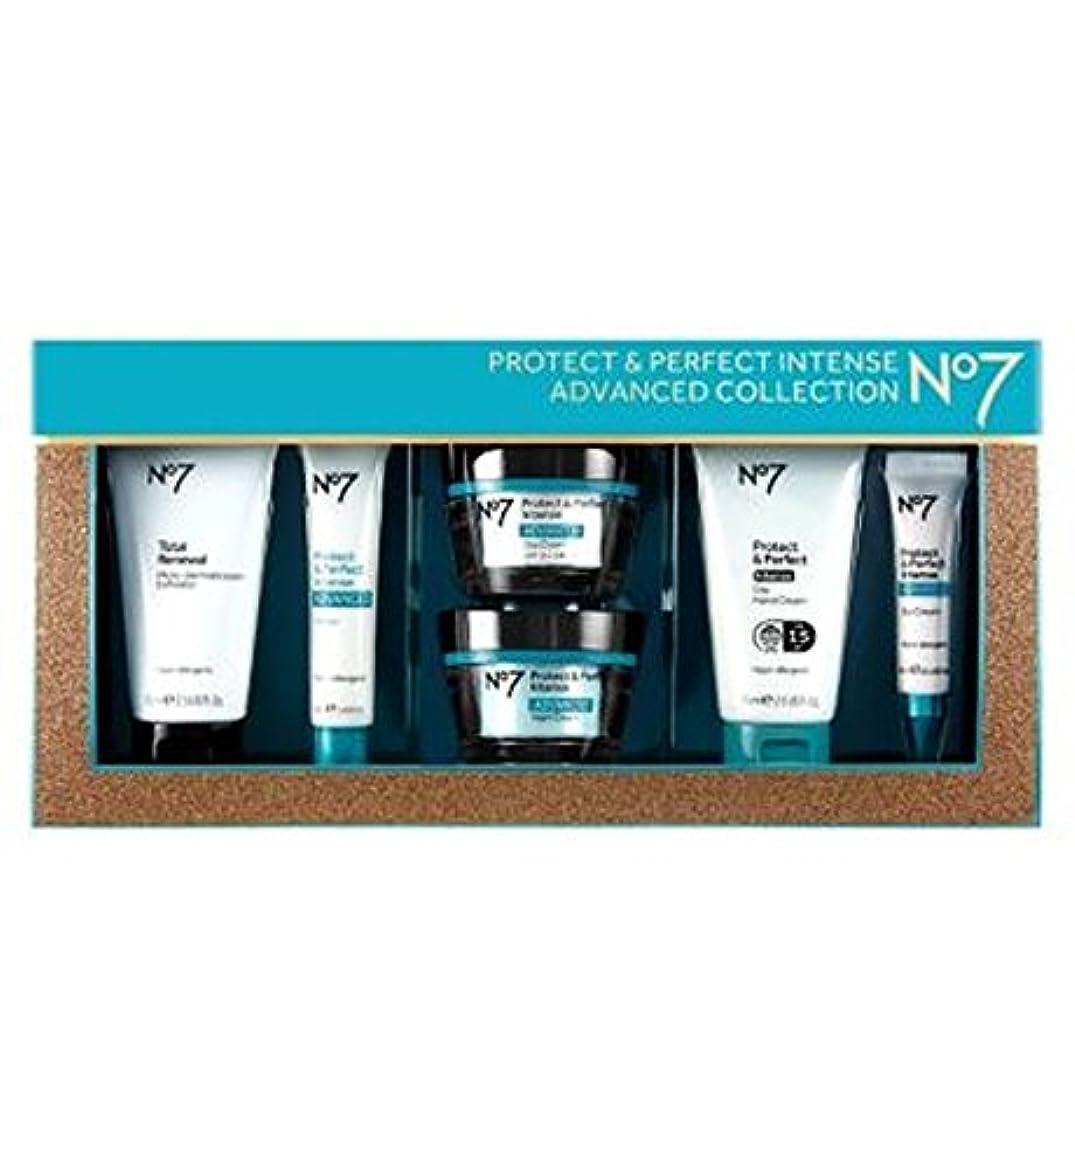 No7保護&完璧な強烈な高度なコレクション (No7) (x2) - No7 Protect & Perfect Intense ADVANCED Collection (Pack of 2) [並行輸入品]